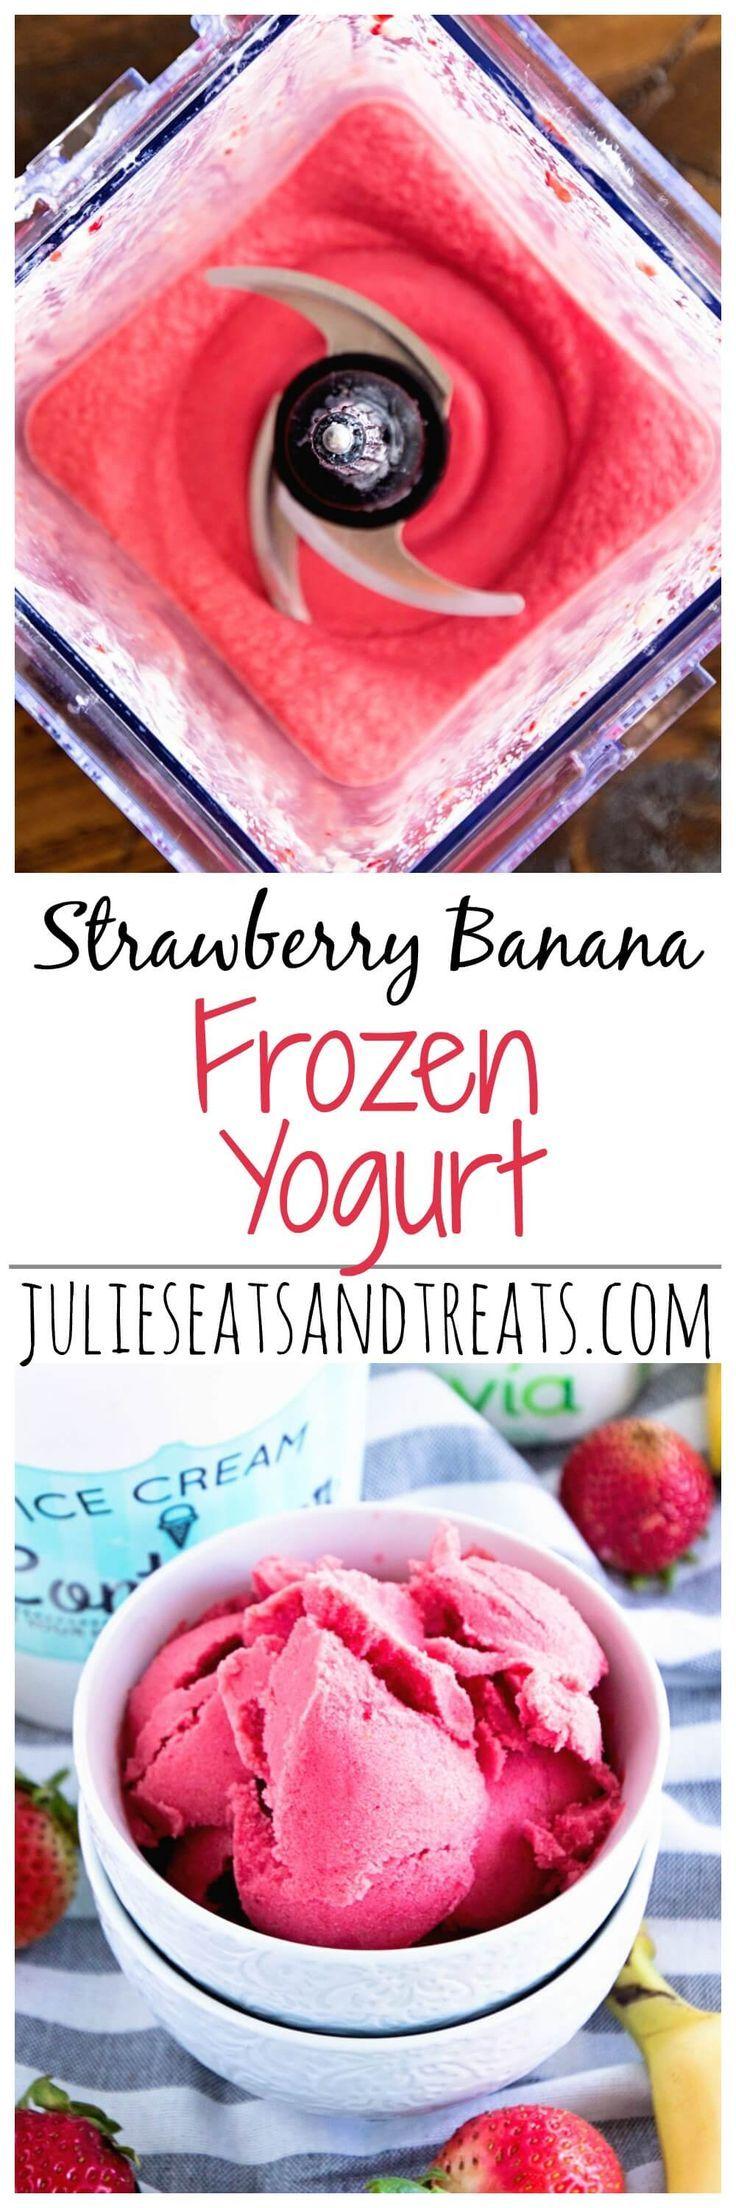 Strawberry Banana Frozen Yogurt ~ Light, Healthy Frozen Yogurt Recipe Loaded with Bananas and Strawberries!